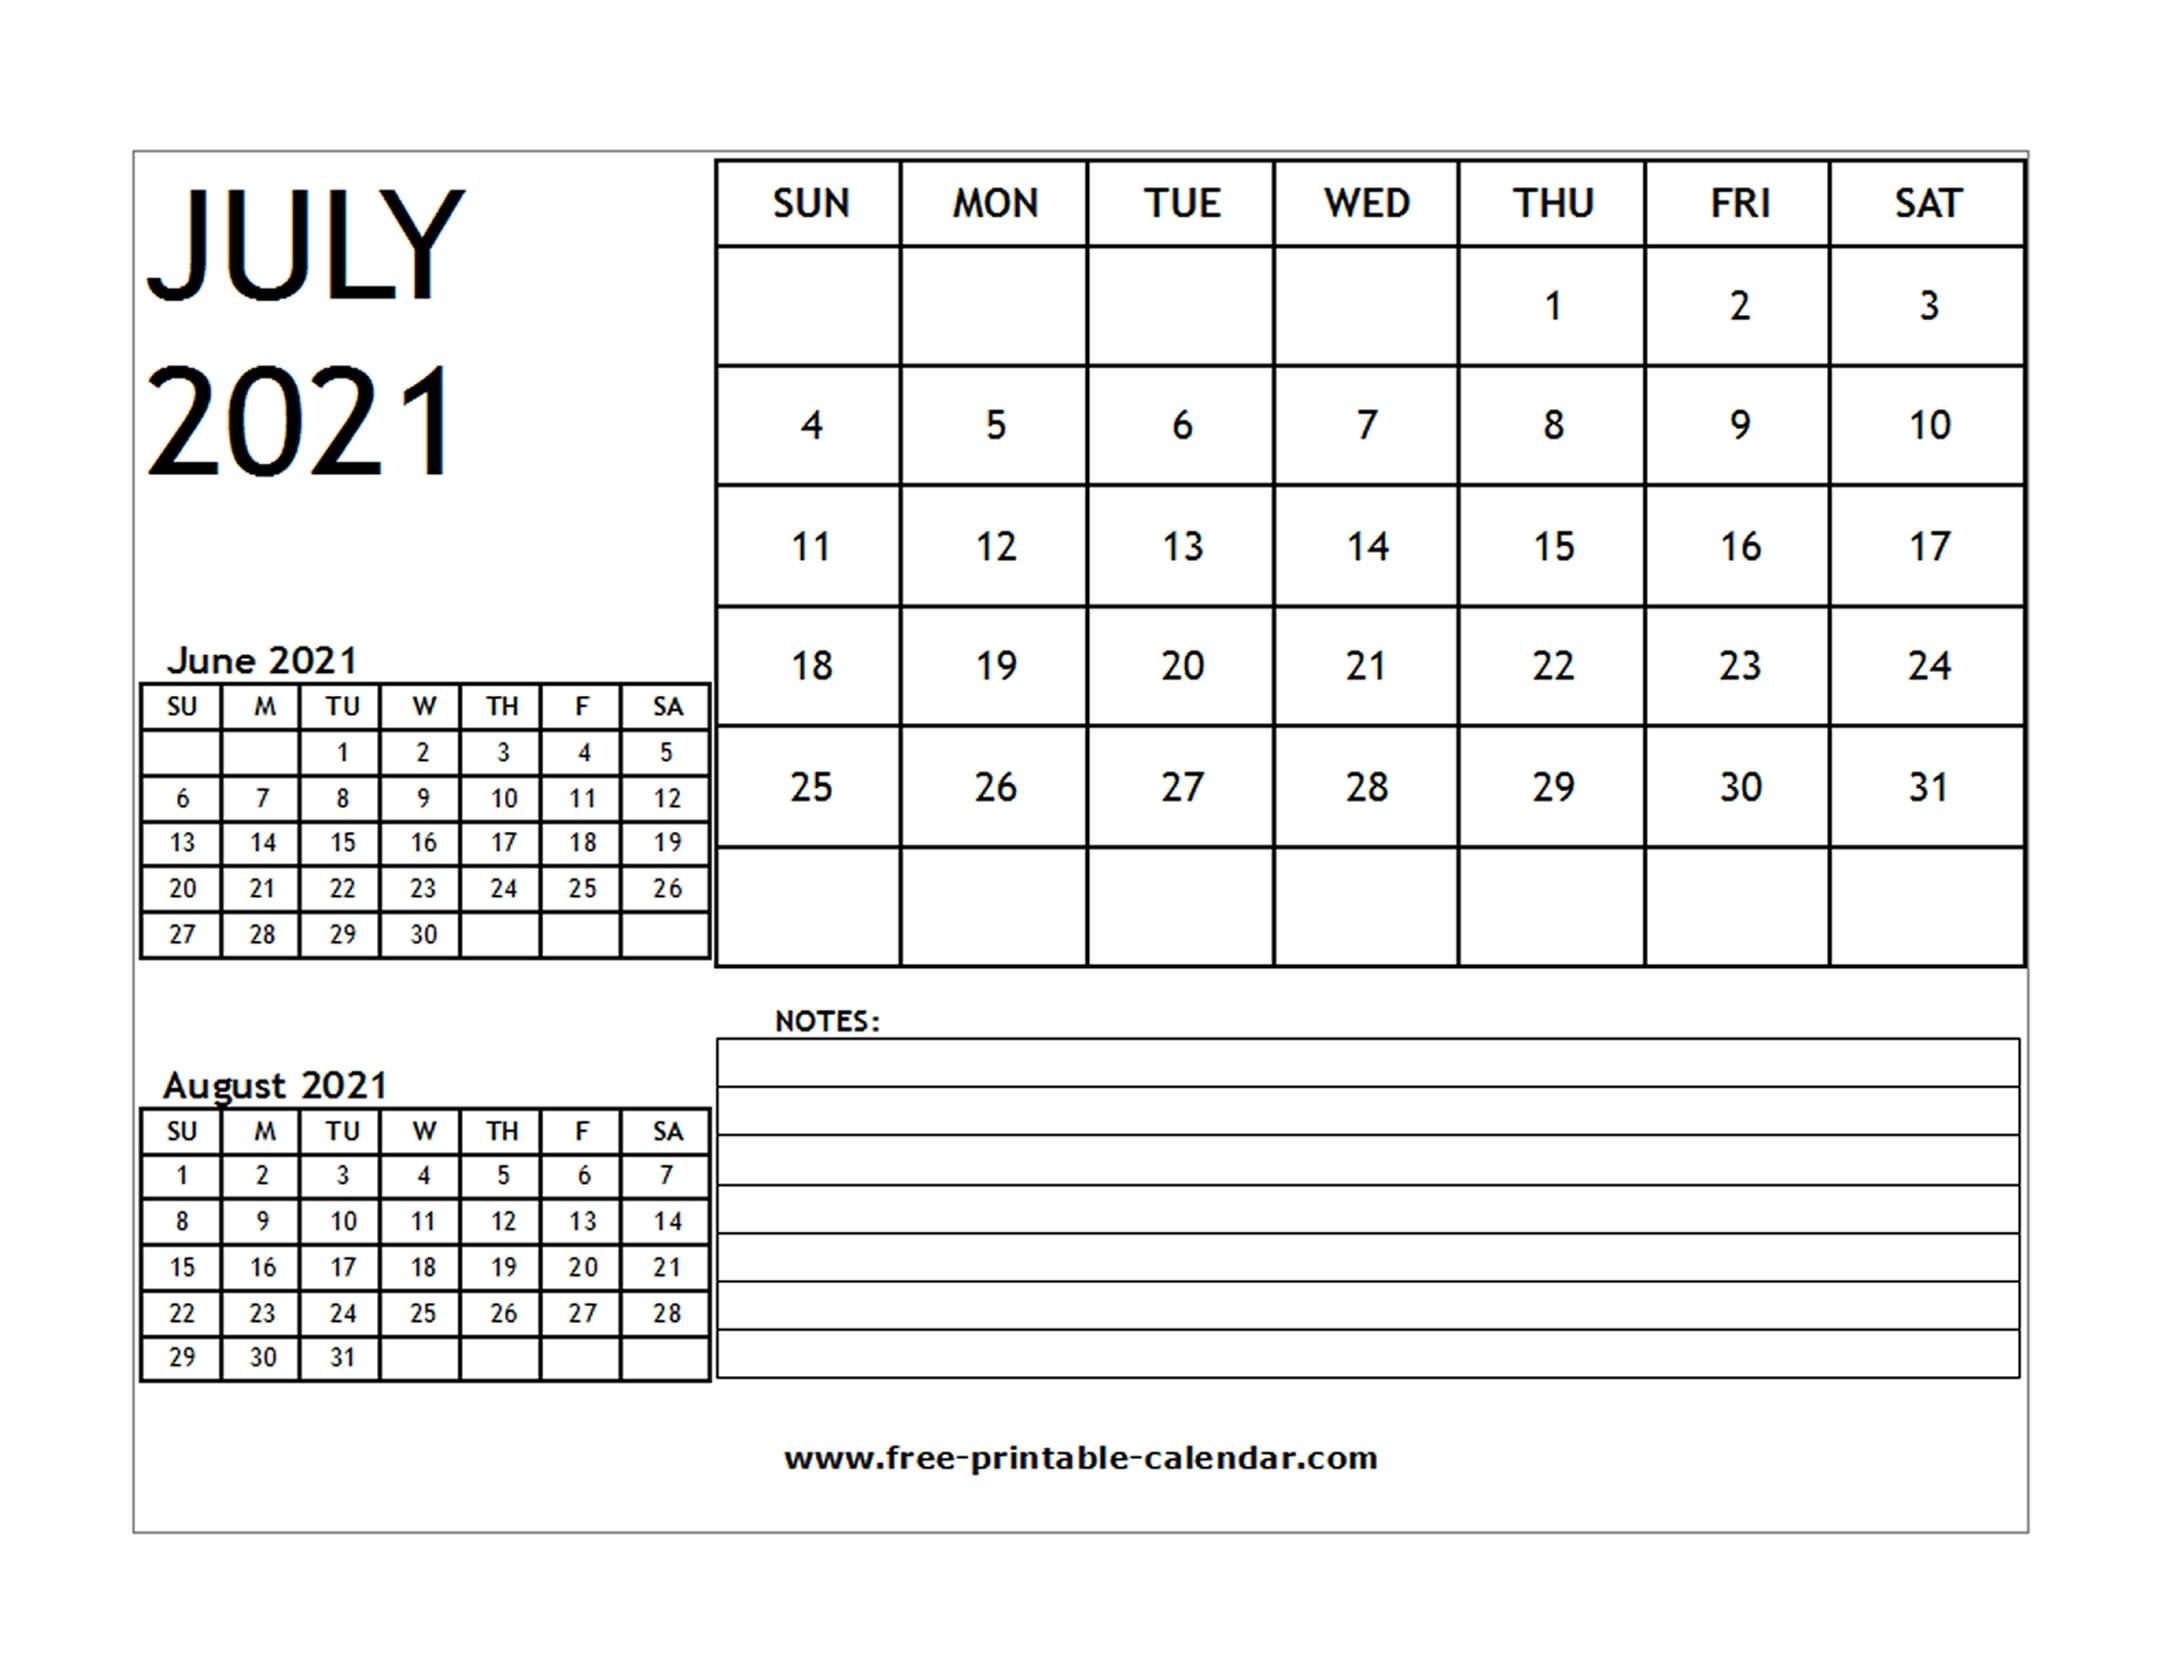 Blank 2021 Calendar July - Free-Printable-Calendar Blank July 2021 Calendar Printable